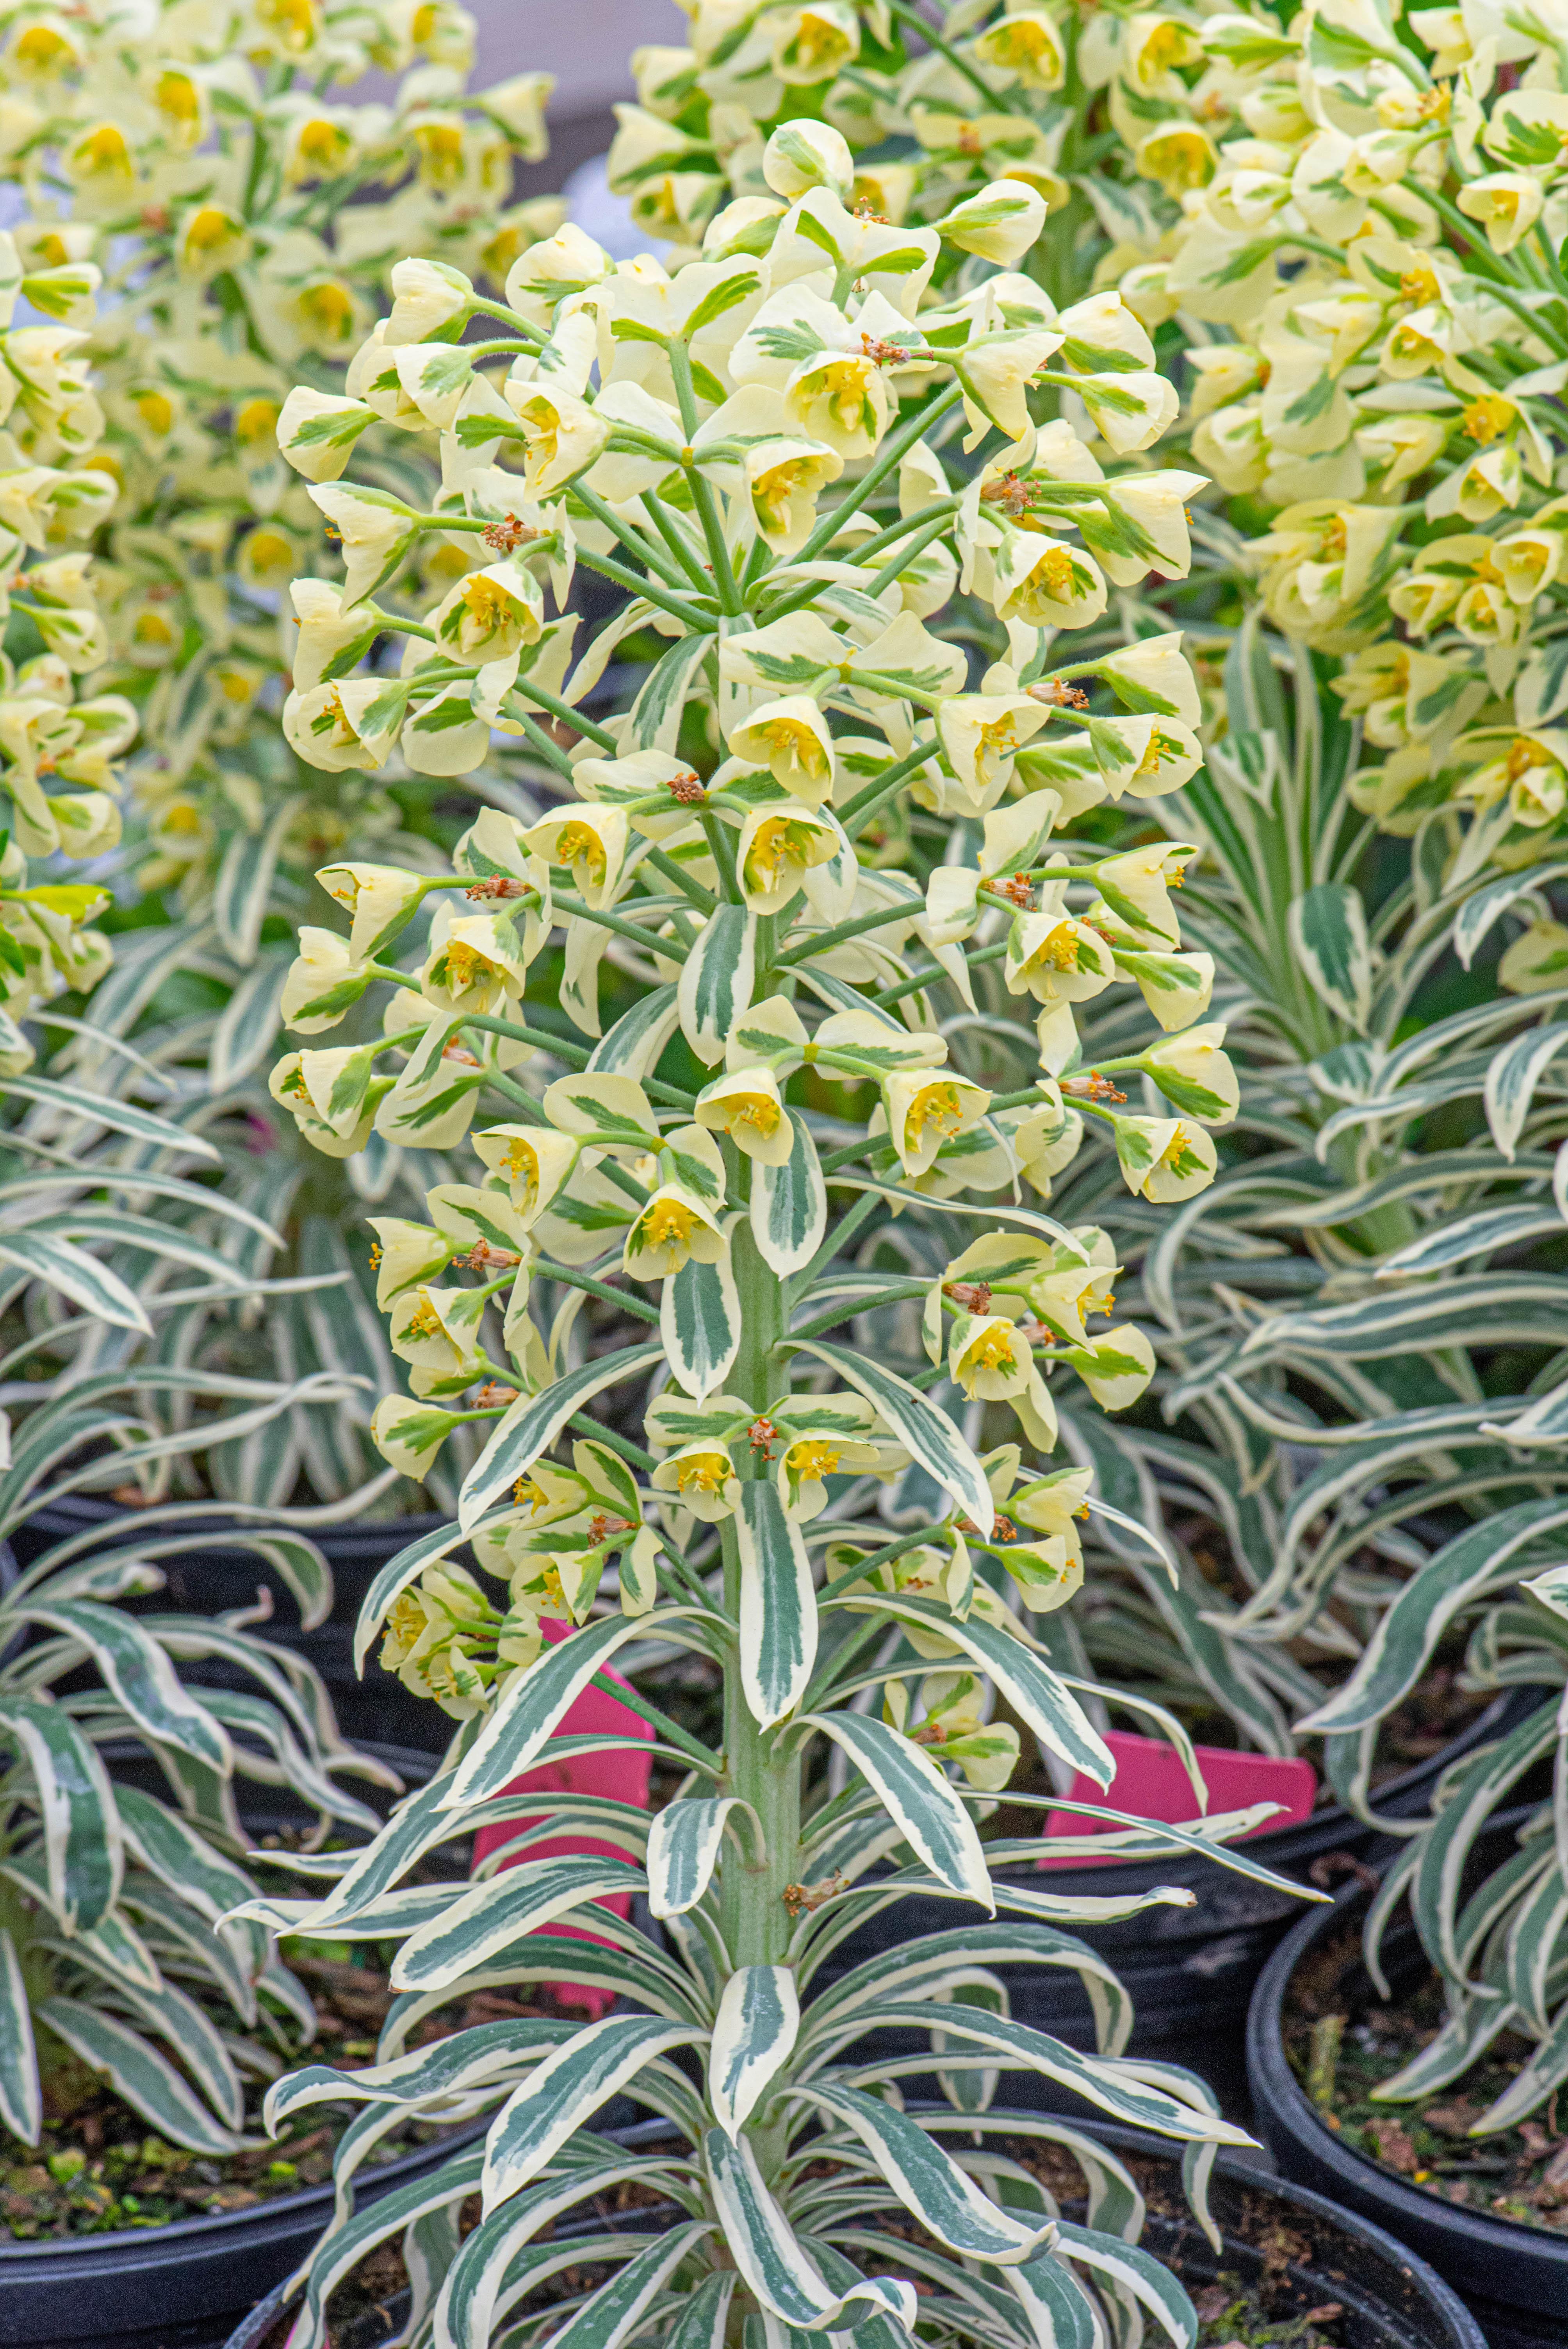 Euphorbia characias 'Tasmanian Tiger', Euphorbia, perennial, sun to part sun